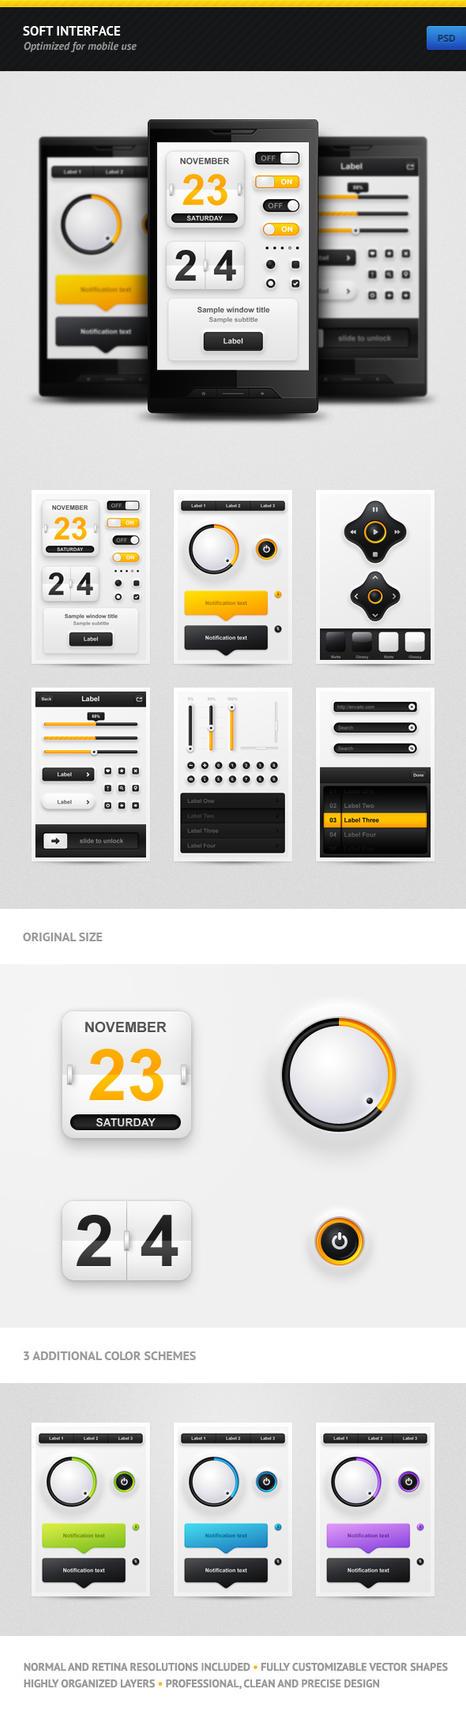 Soft Interface by erigongraphics